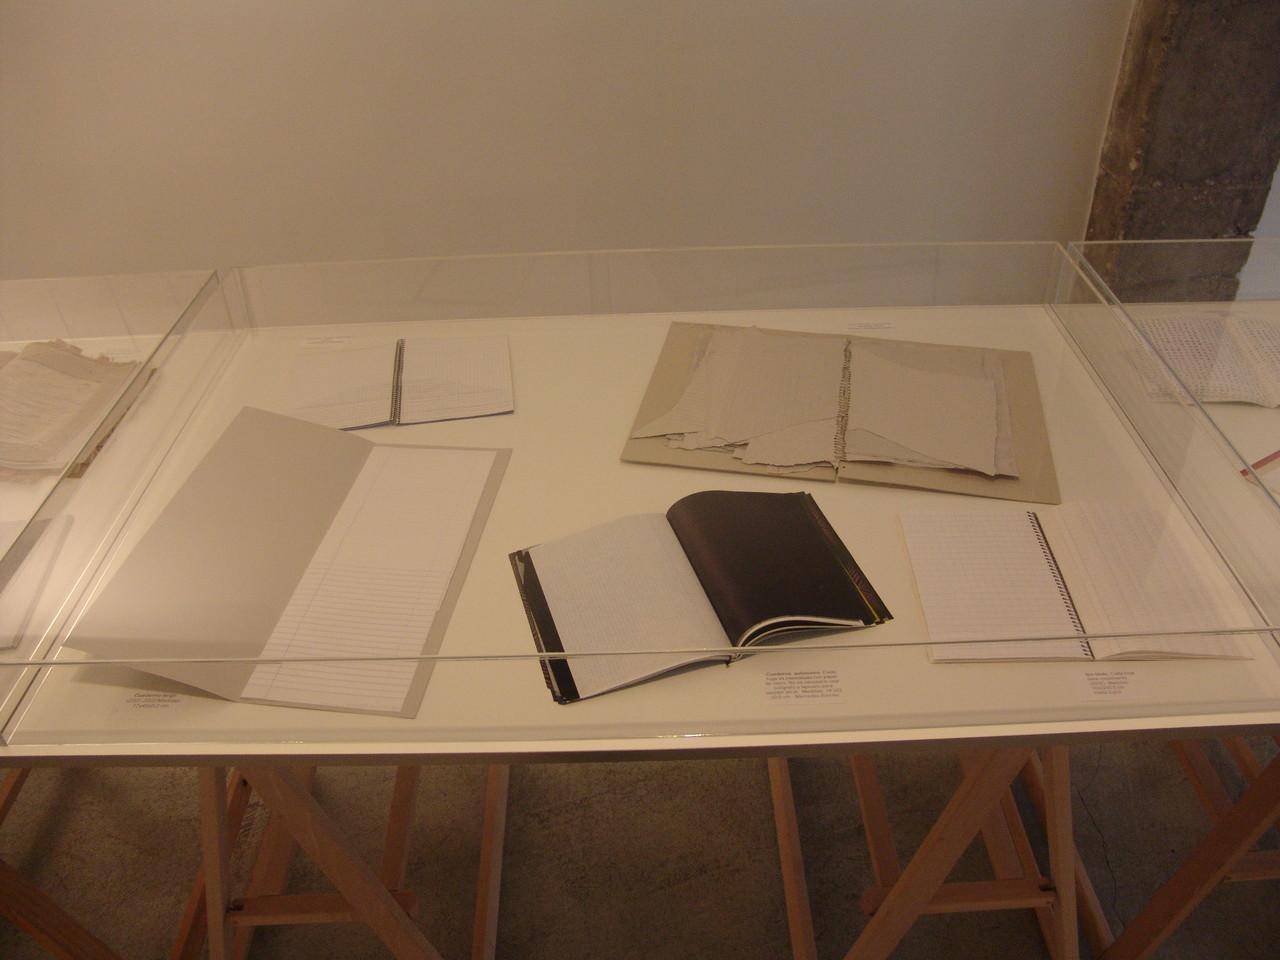 Trinidad Irisarri. 'Cuadernos'